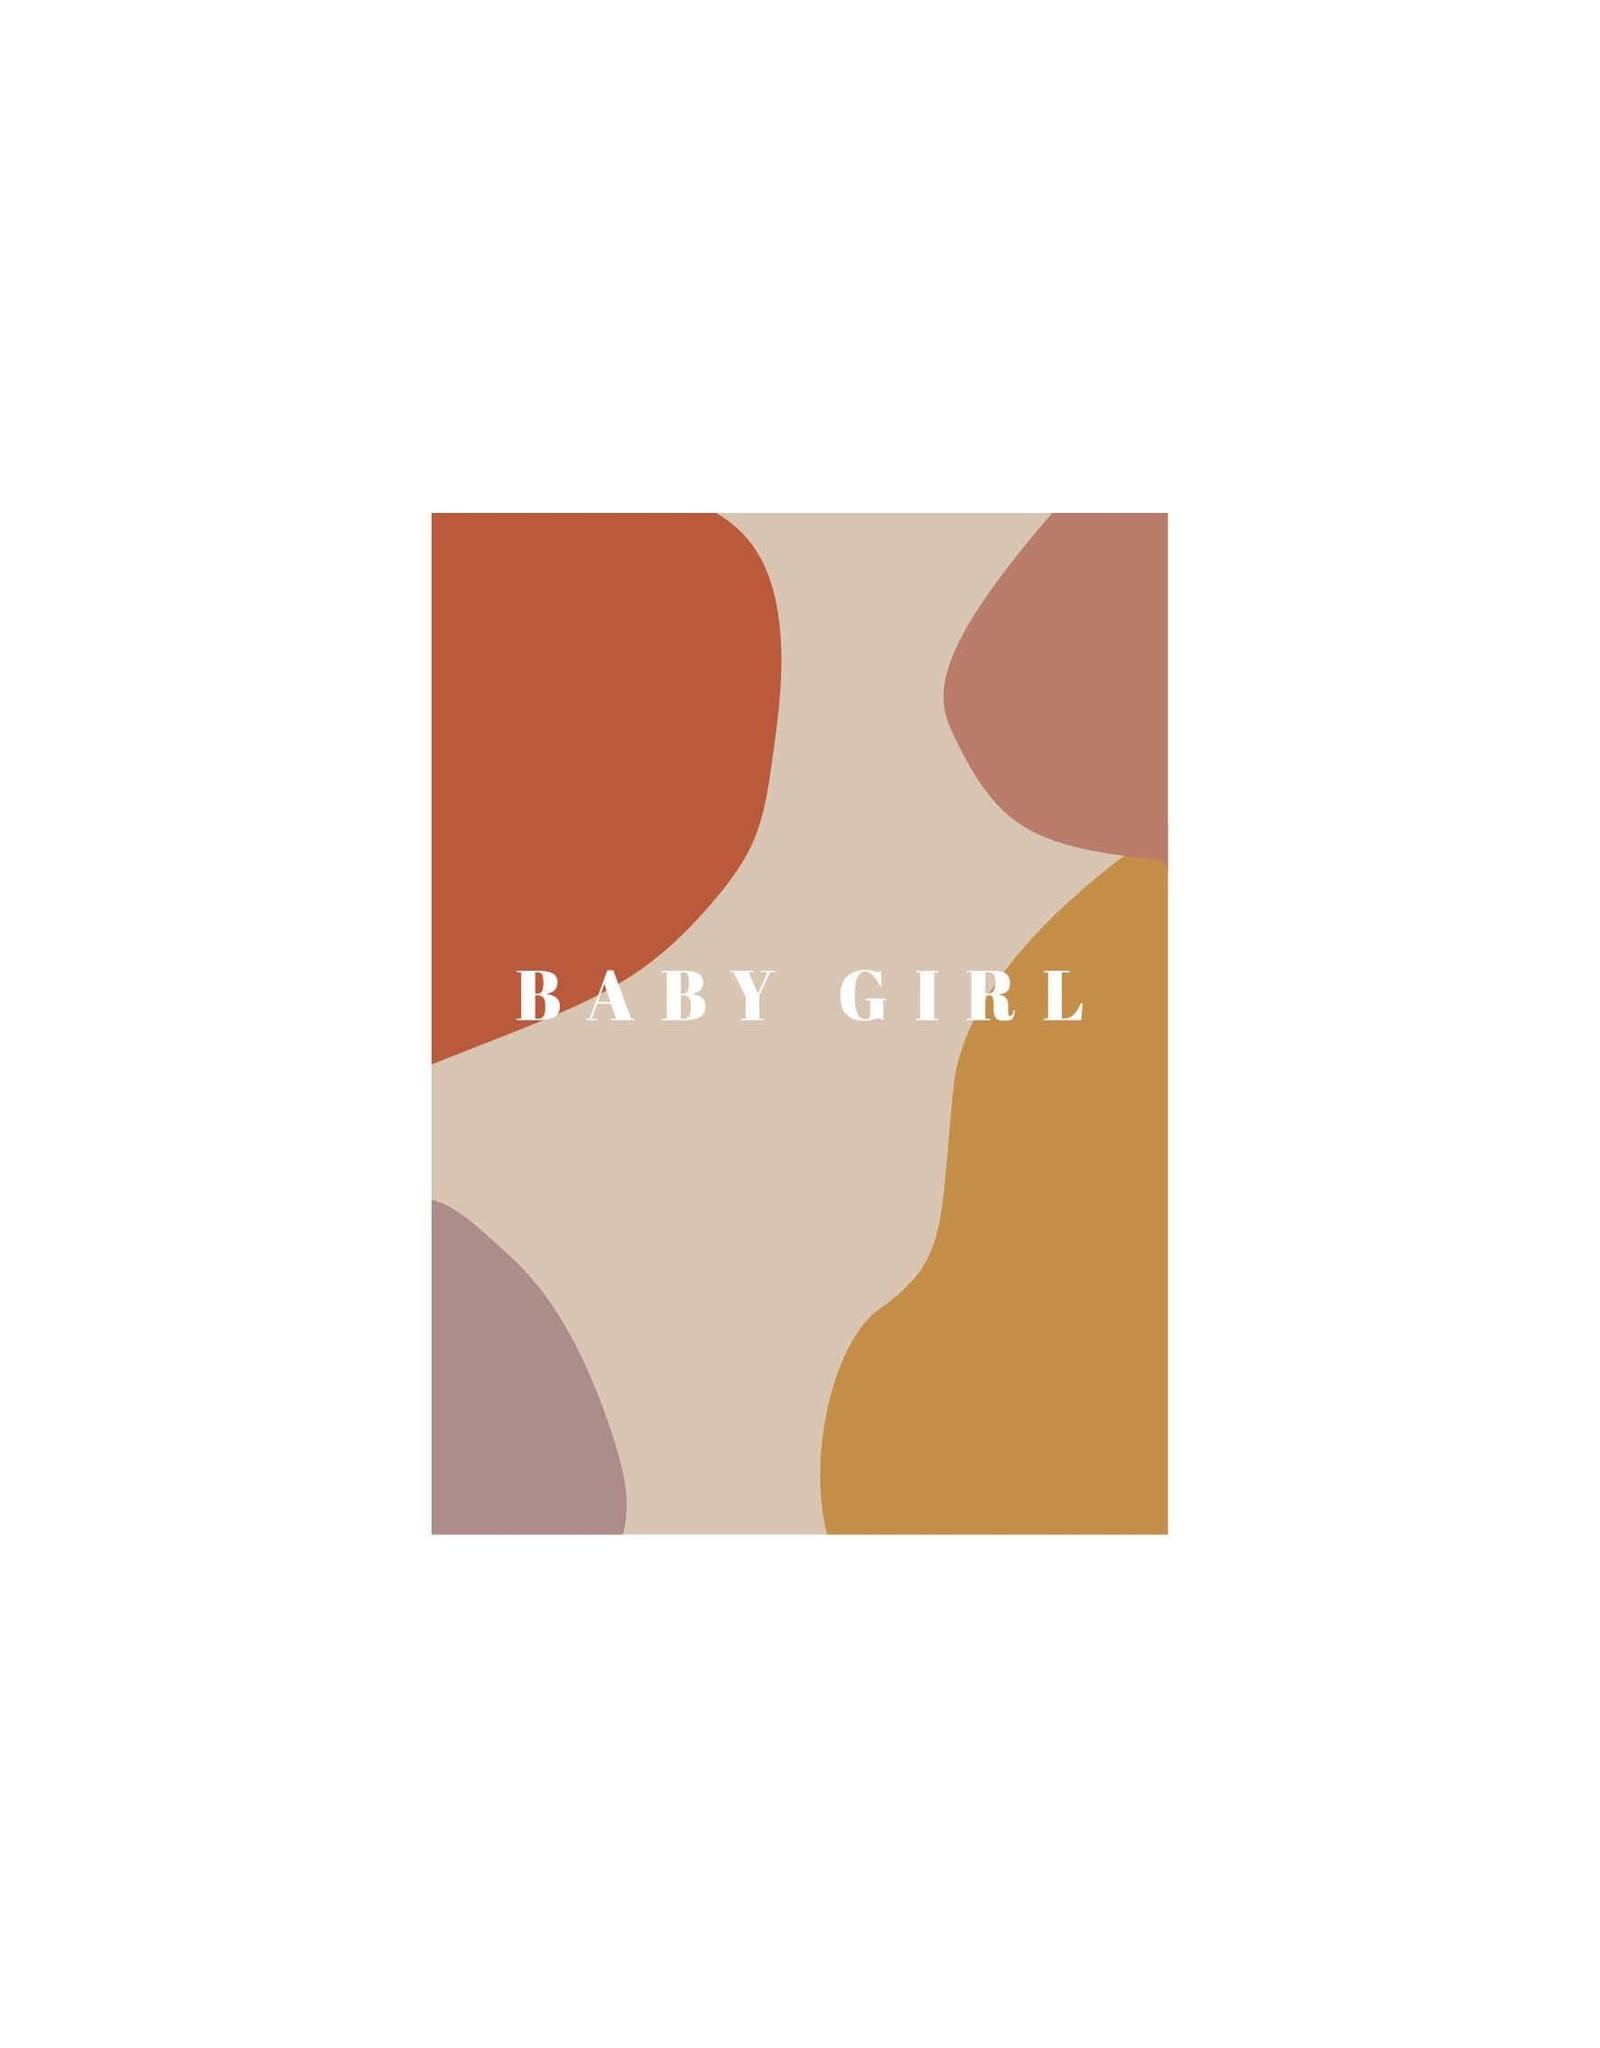 studiobydiede Wenskaart baby girl